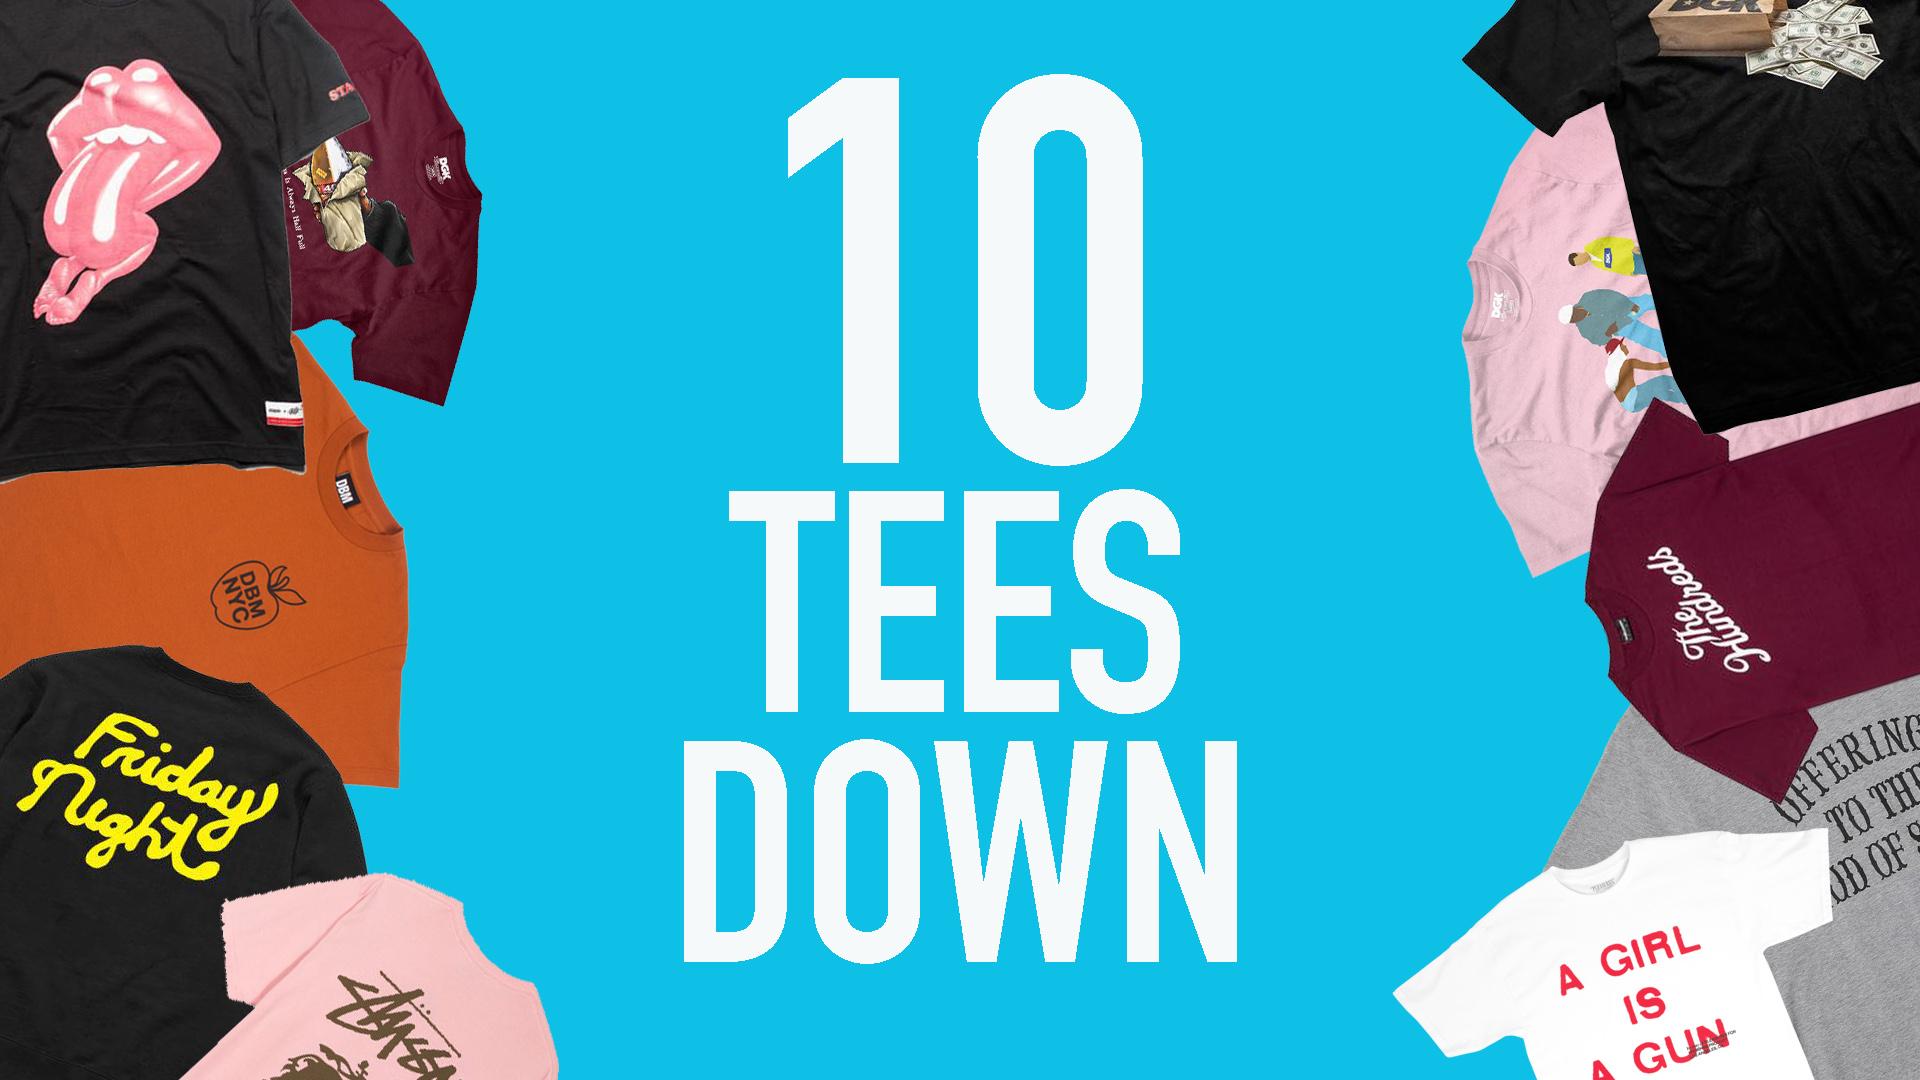 10TeesDownBanner6.jpg